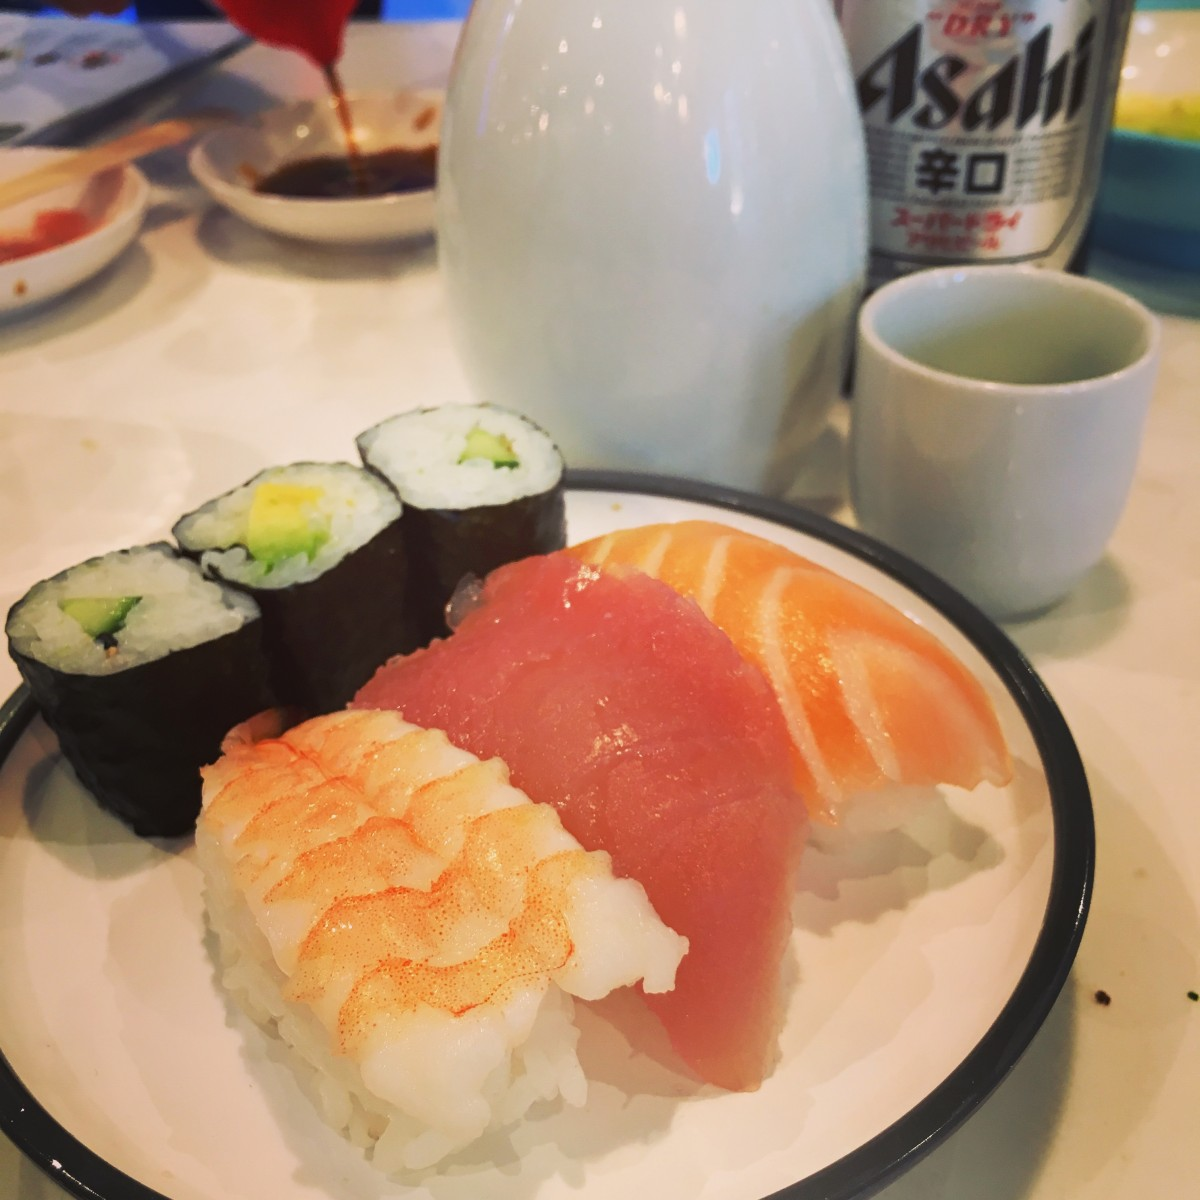 Harrogate Mama, Harrogate Mama Blog, YO! Sushi, Blogger, Harrogate, Mama, Blog,IMG_2014.jpg